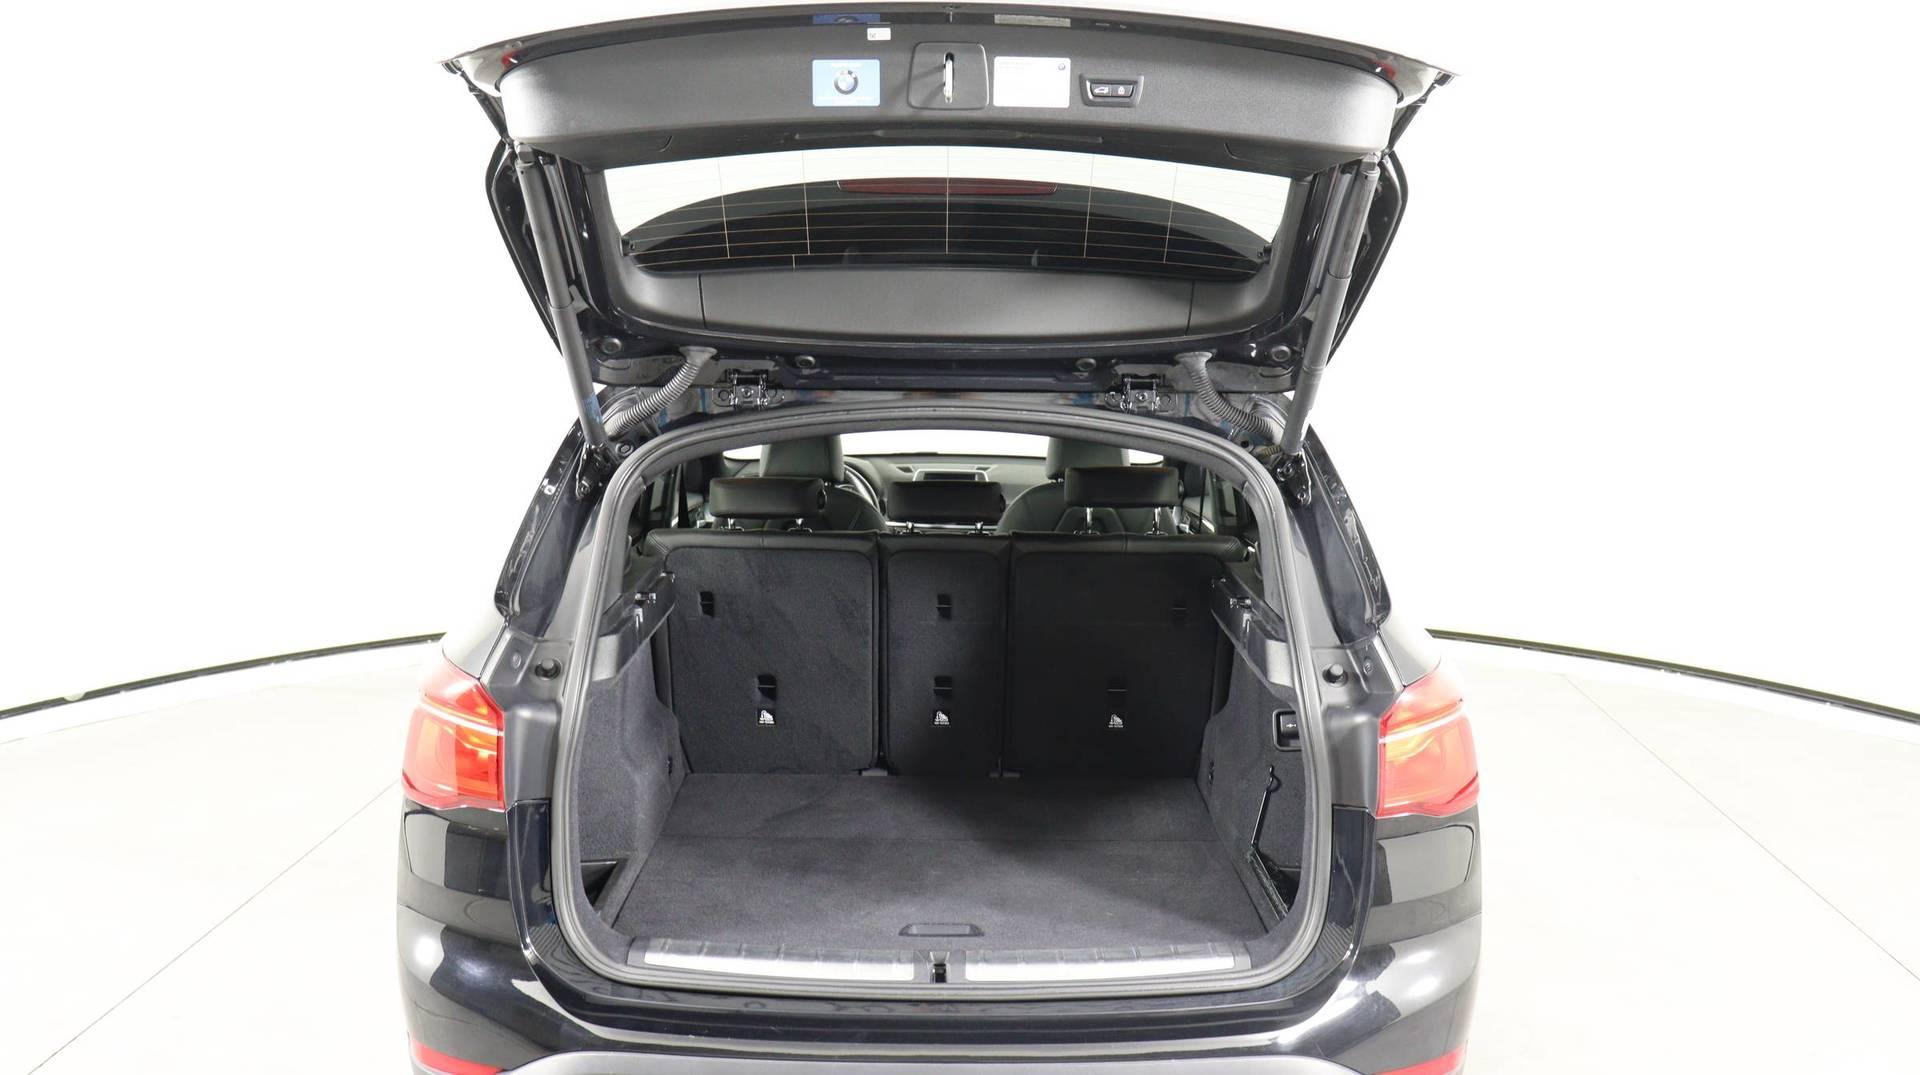 used vehicle - SUV BMW X1 2018